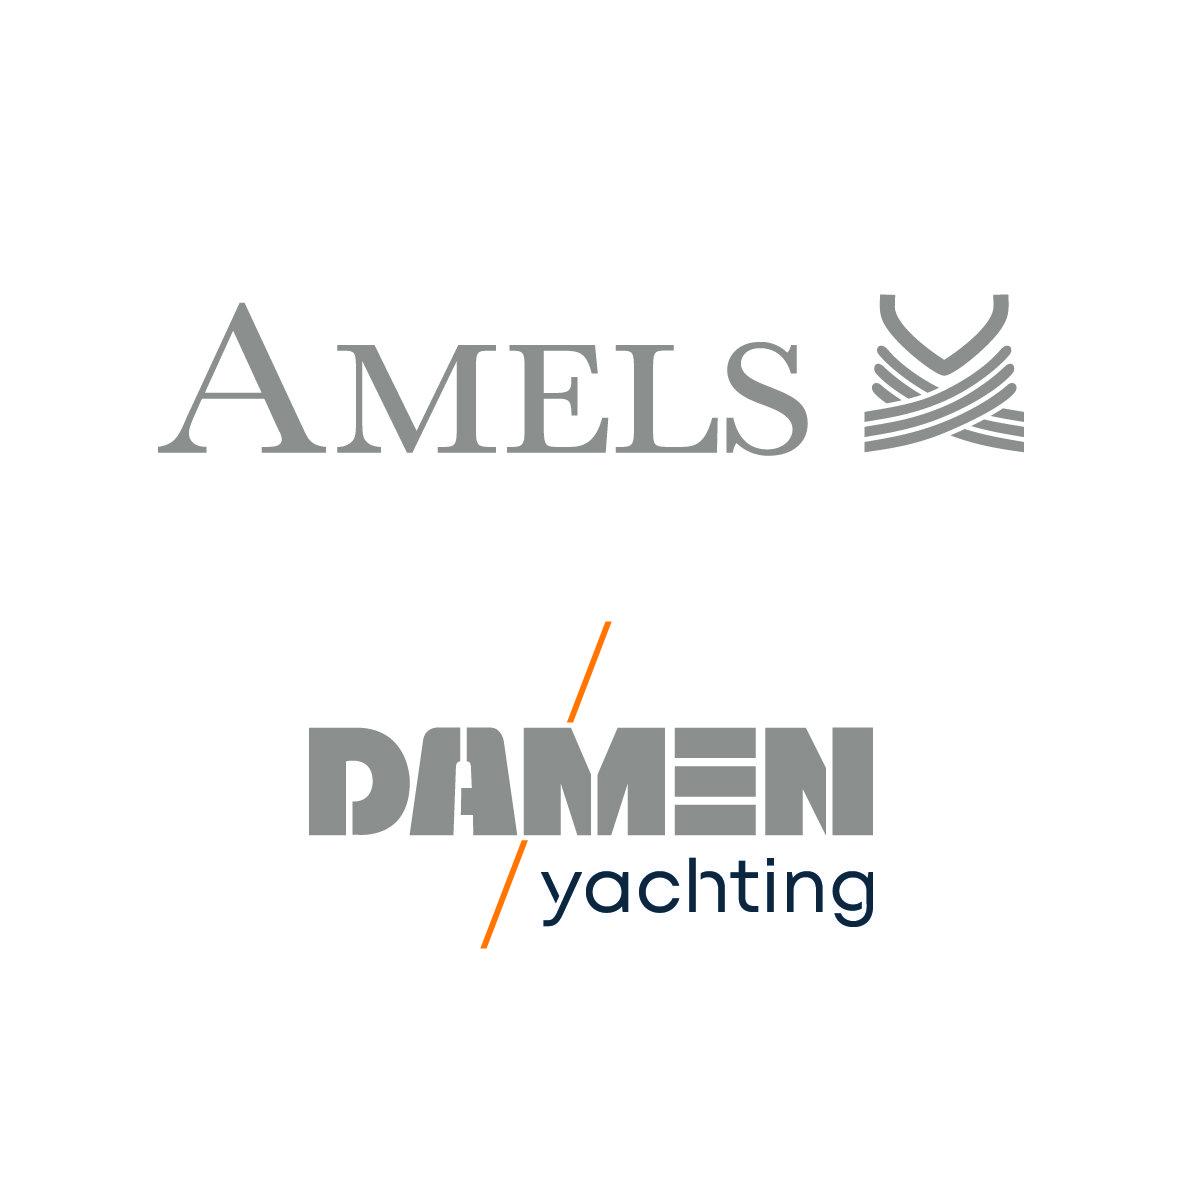 Amels & Damen Yachting